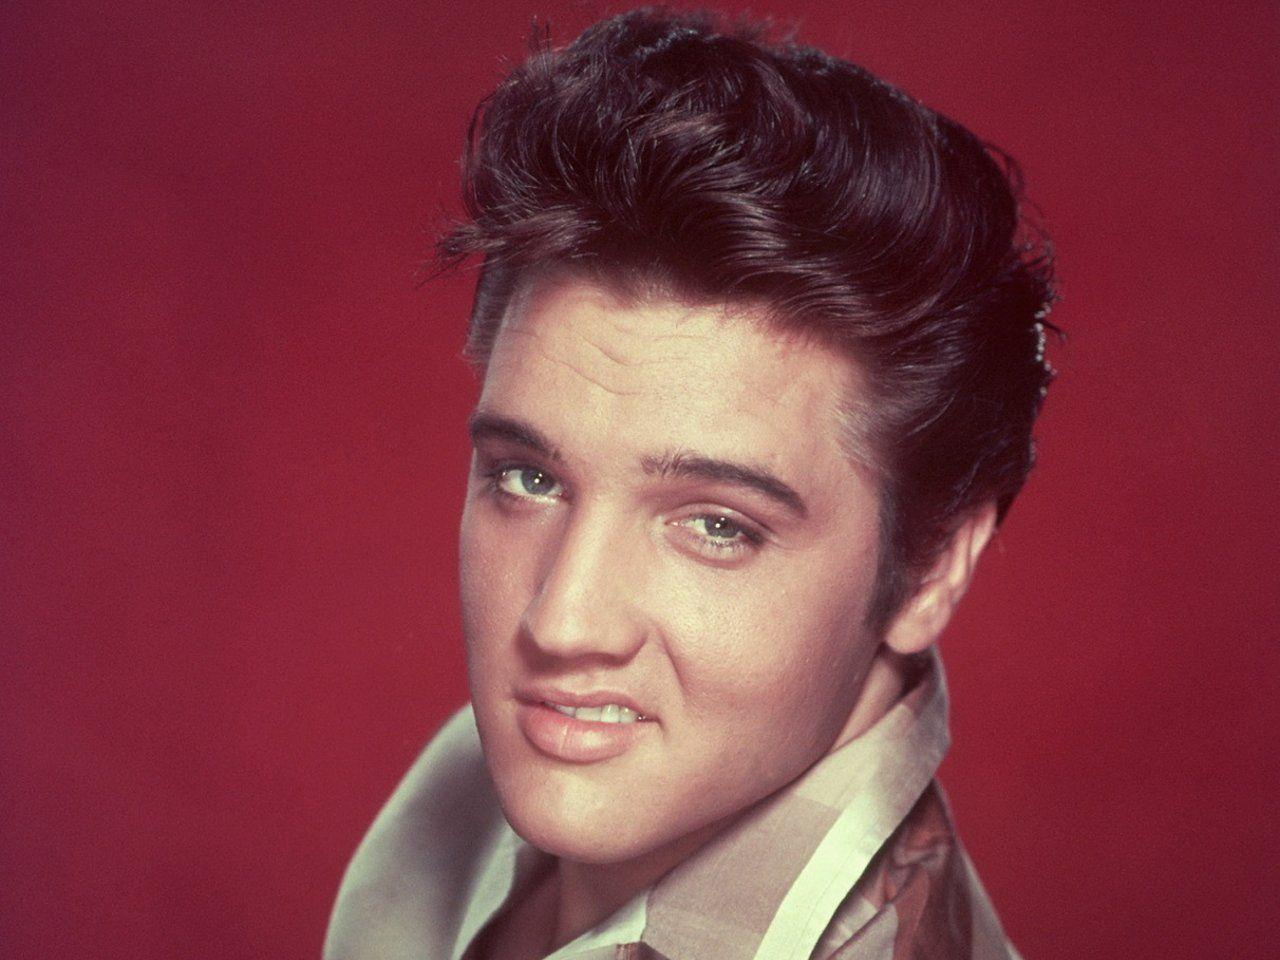 Elvis Presley canzoni più belle